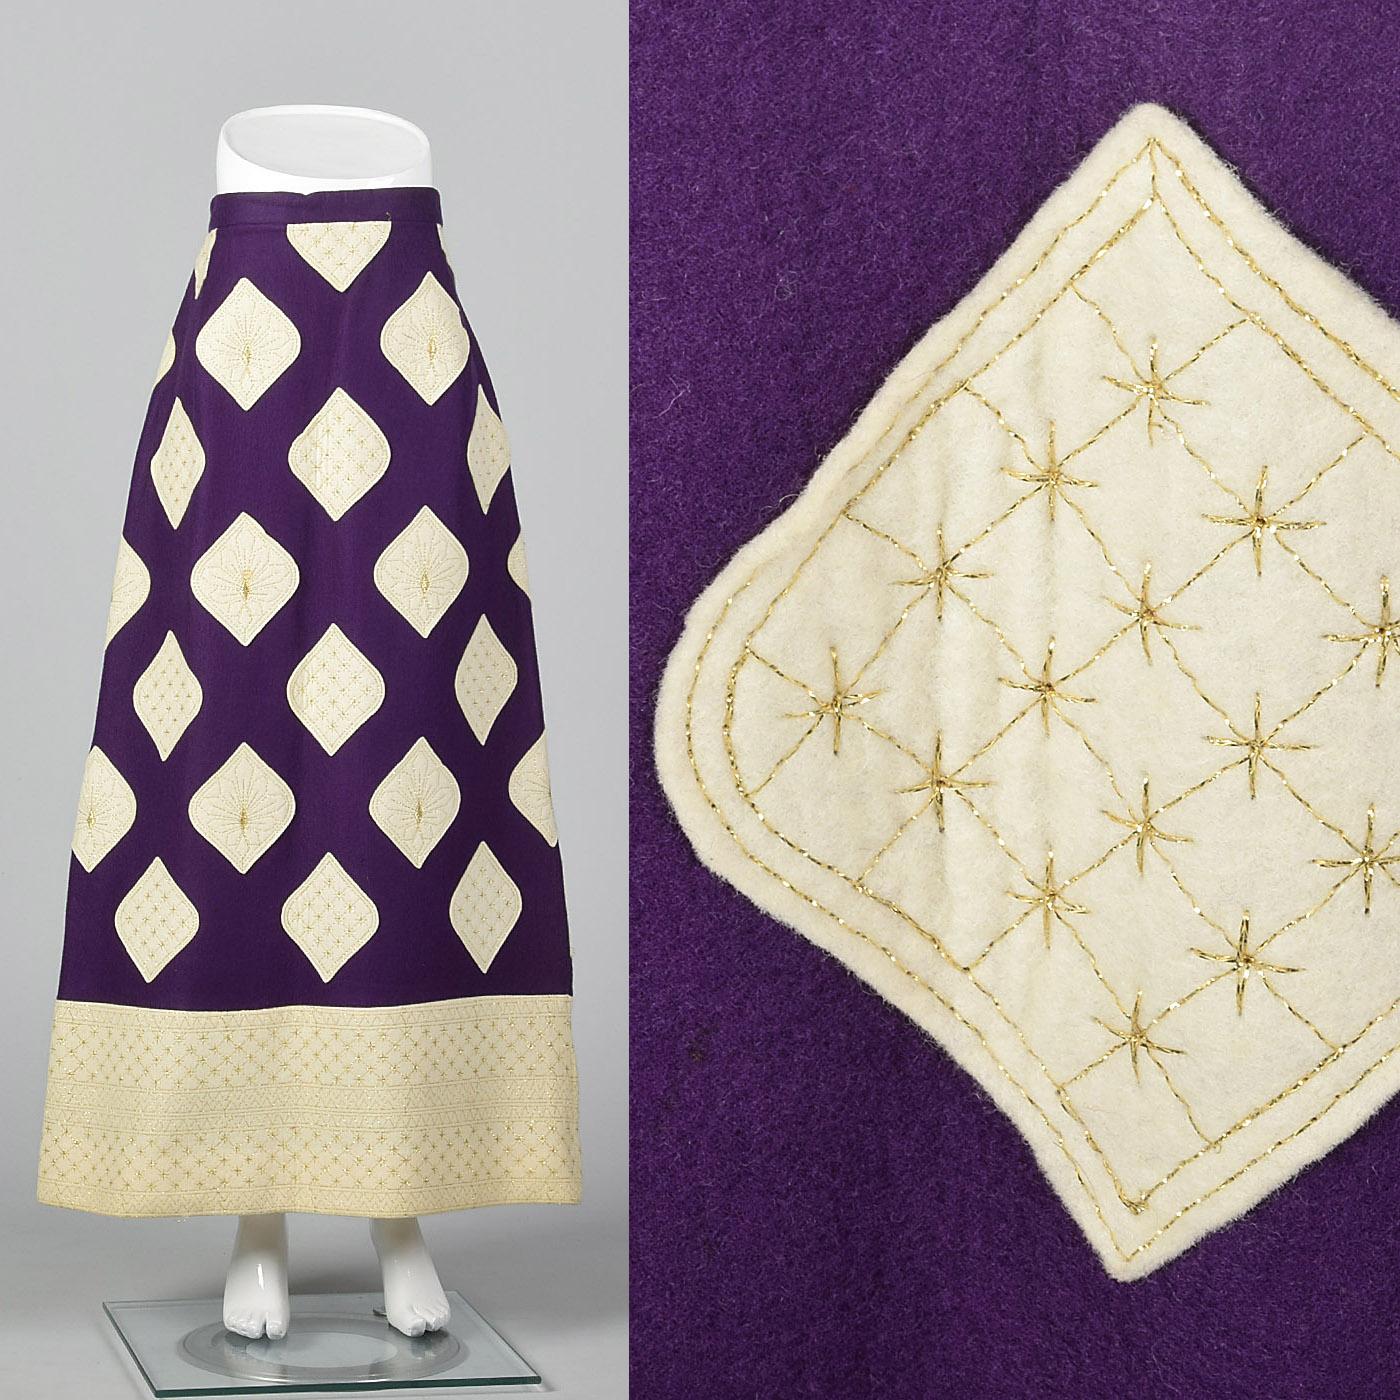 9c72fbb7abcd13 Details about L 1970s Malcolm Charles Maxi Skirt Purple Felt Designer  Separates Op Art Vintage